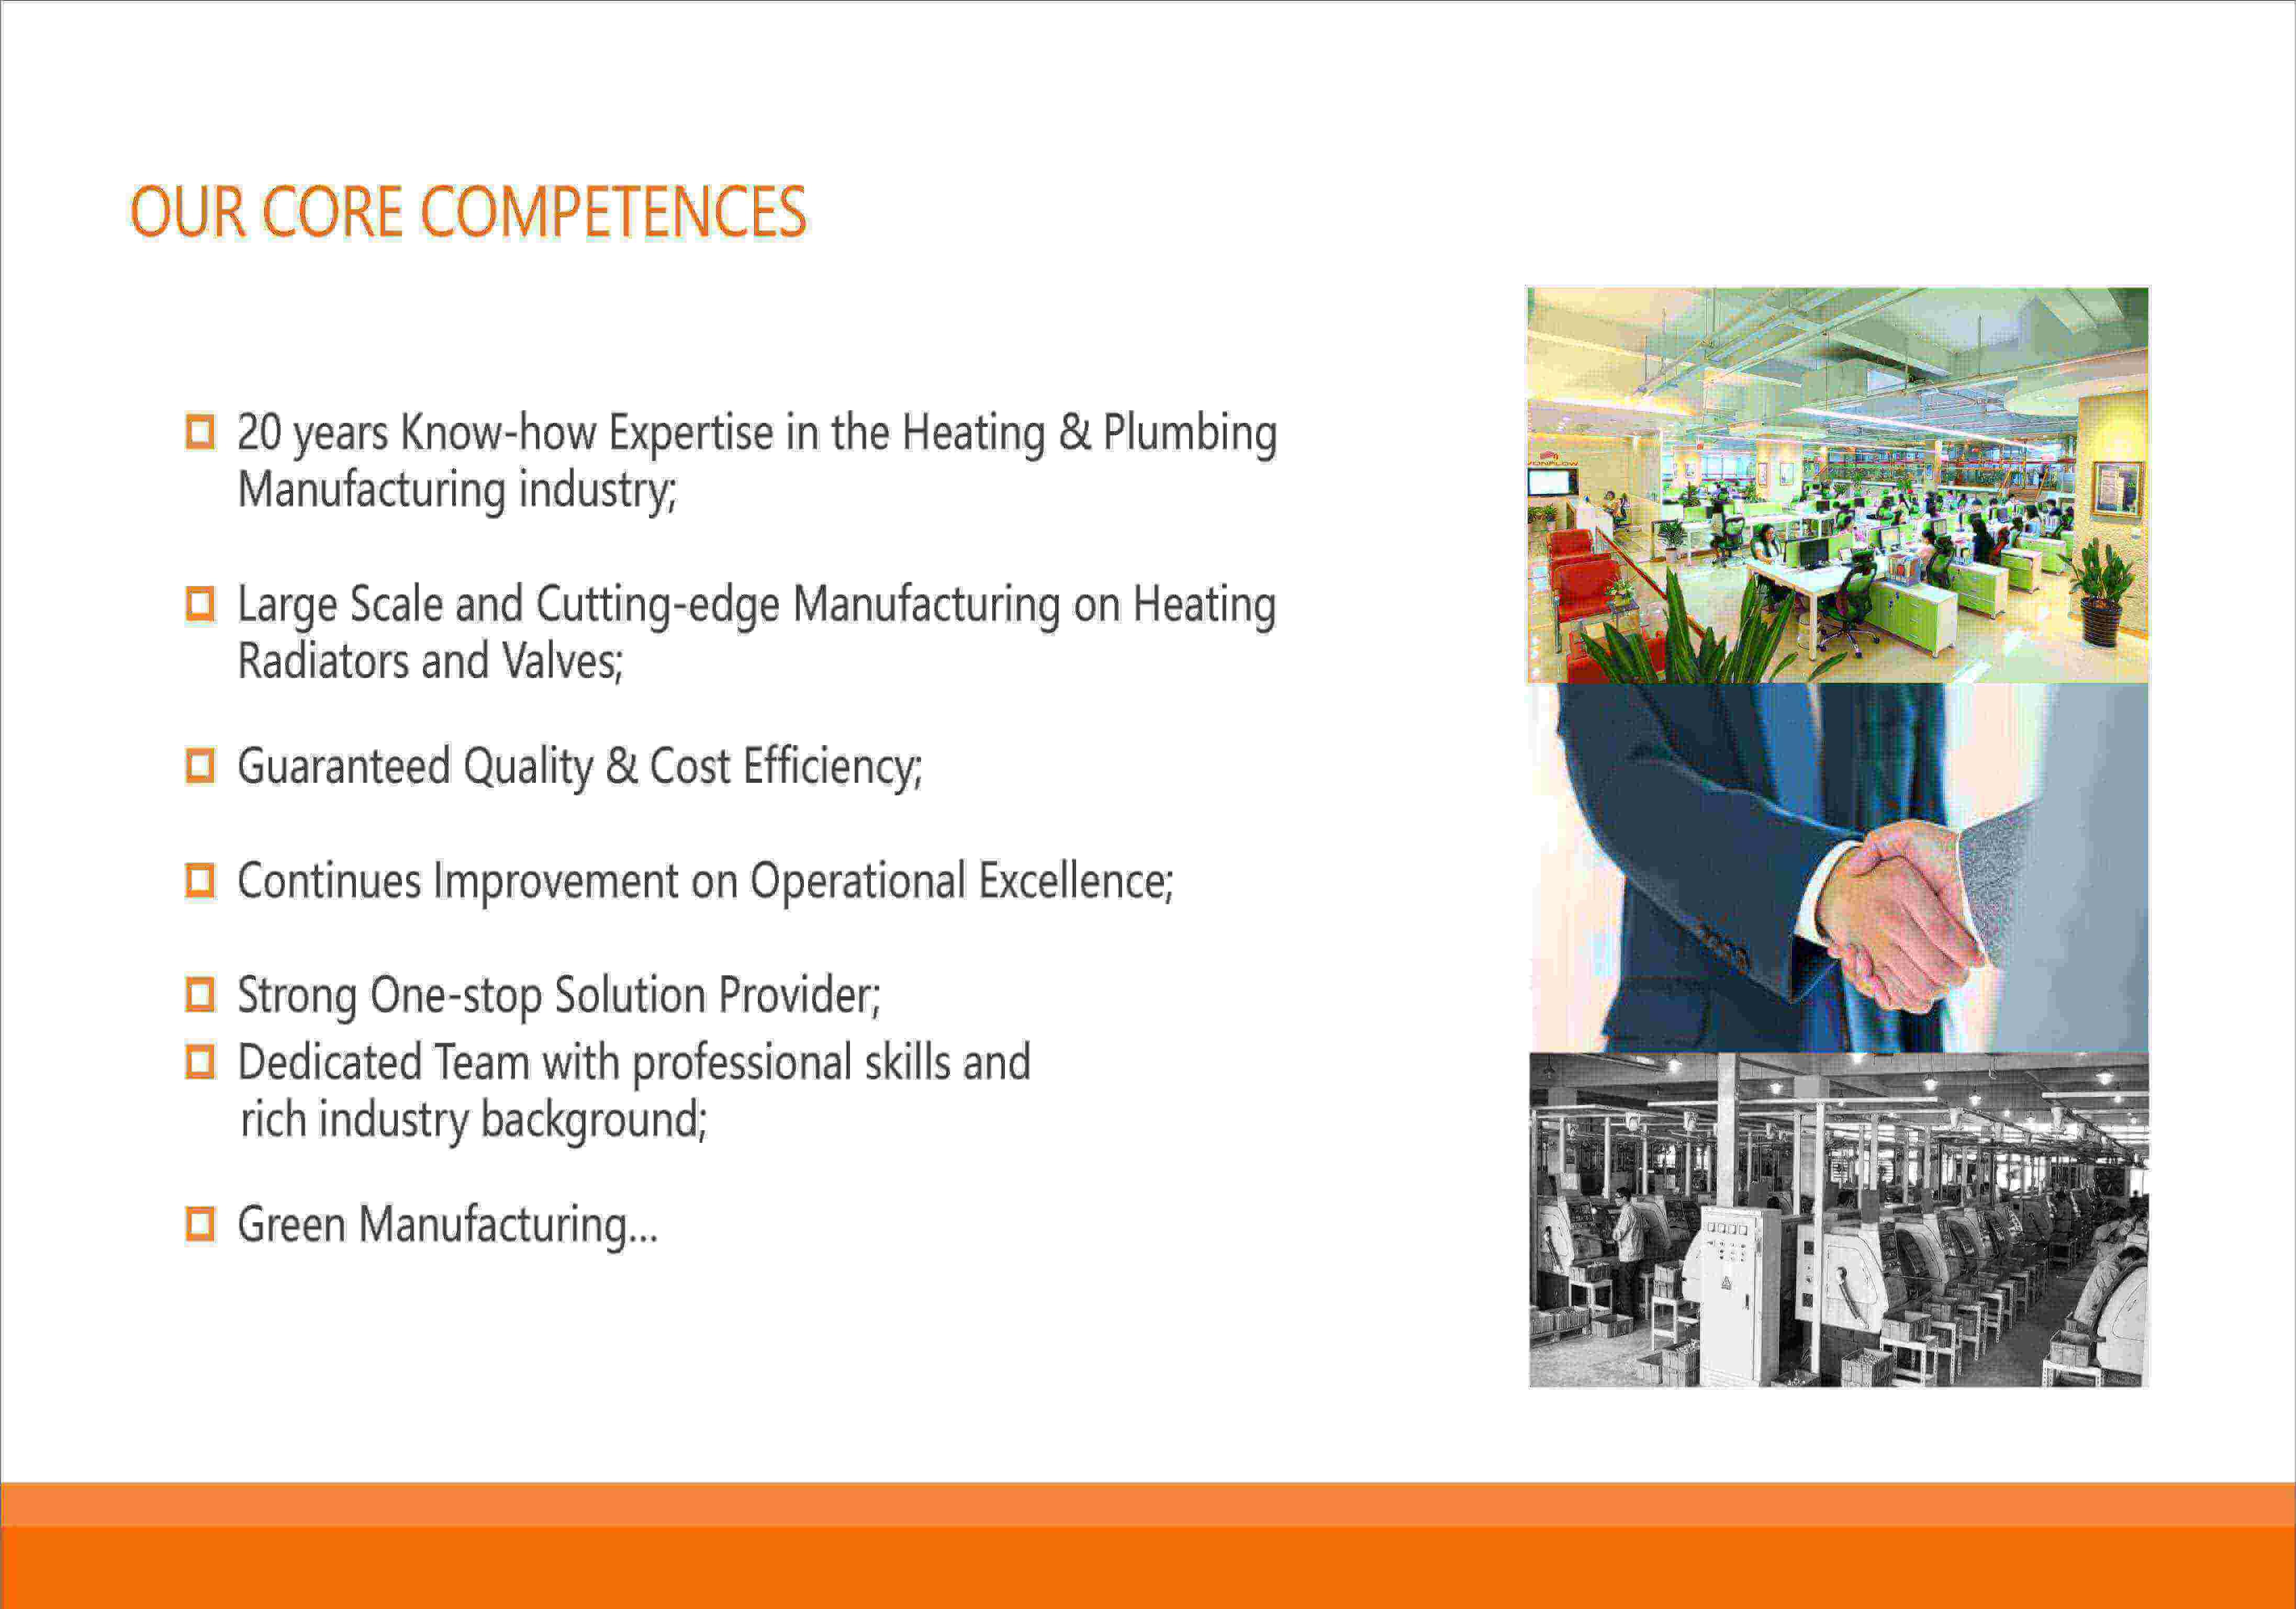 towel radiator manufacturers competences